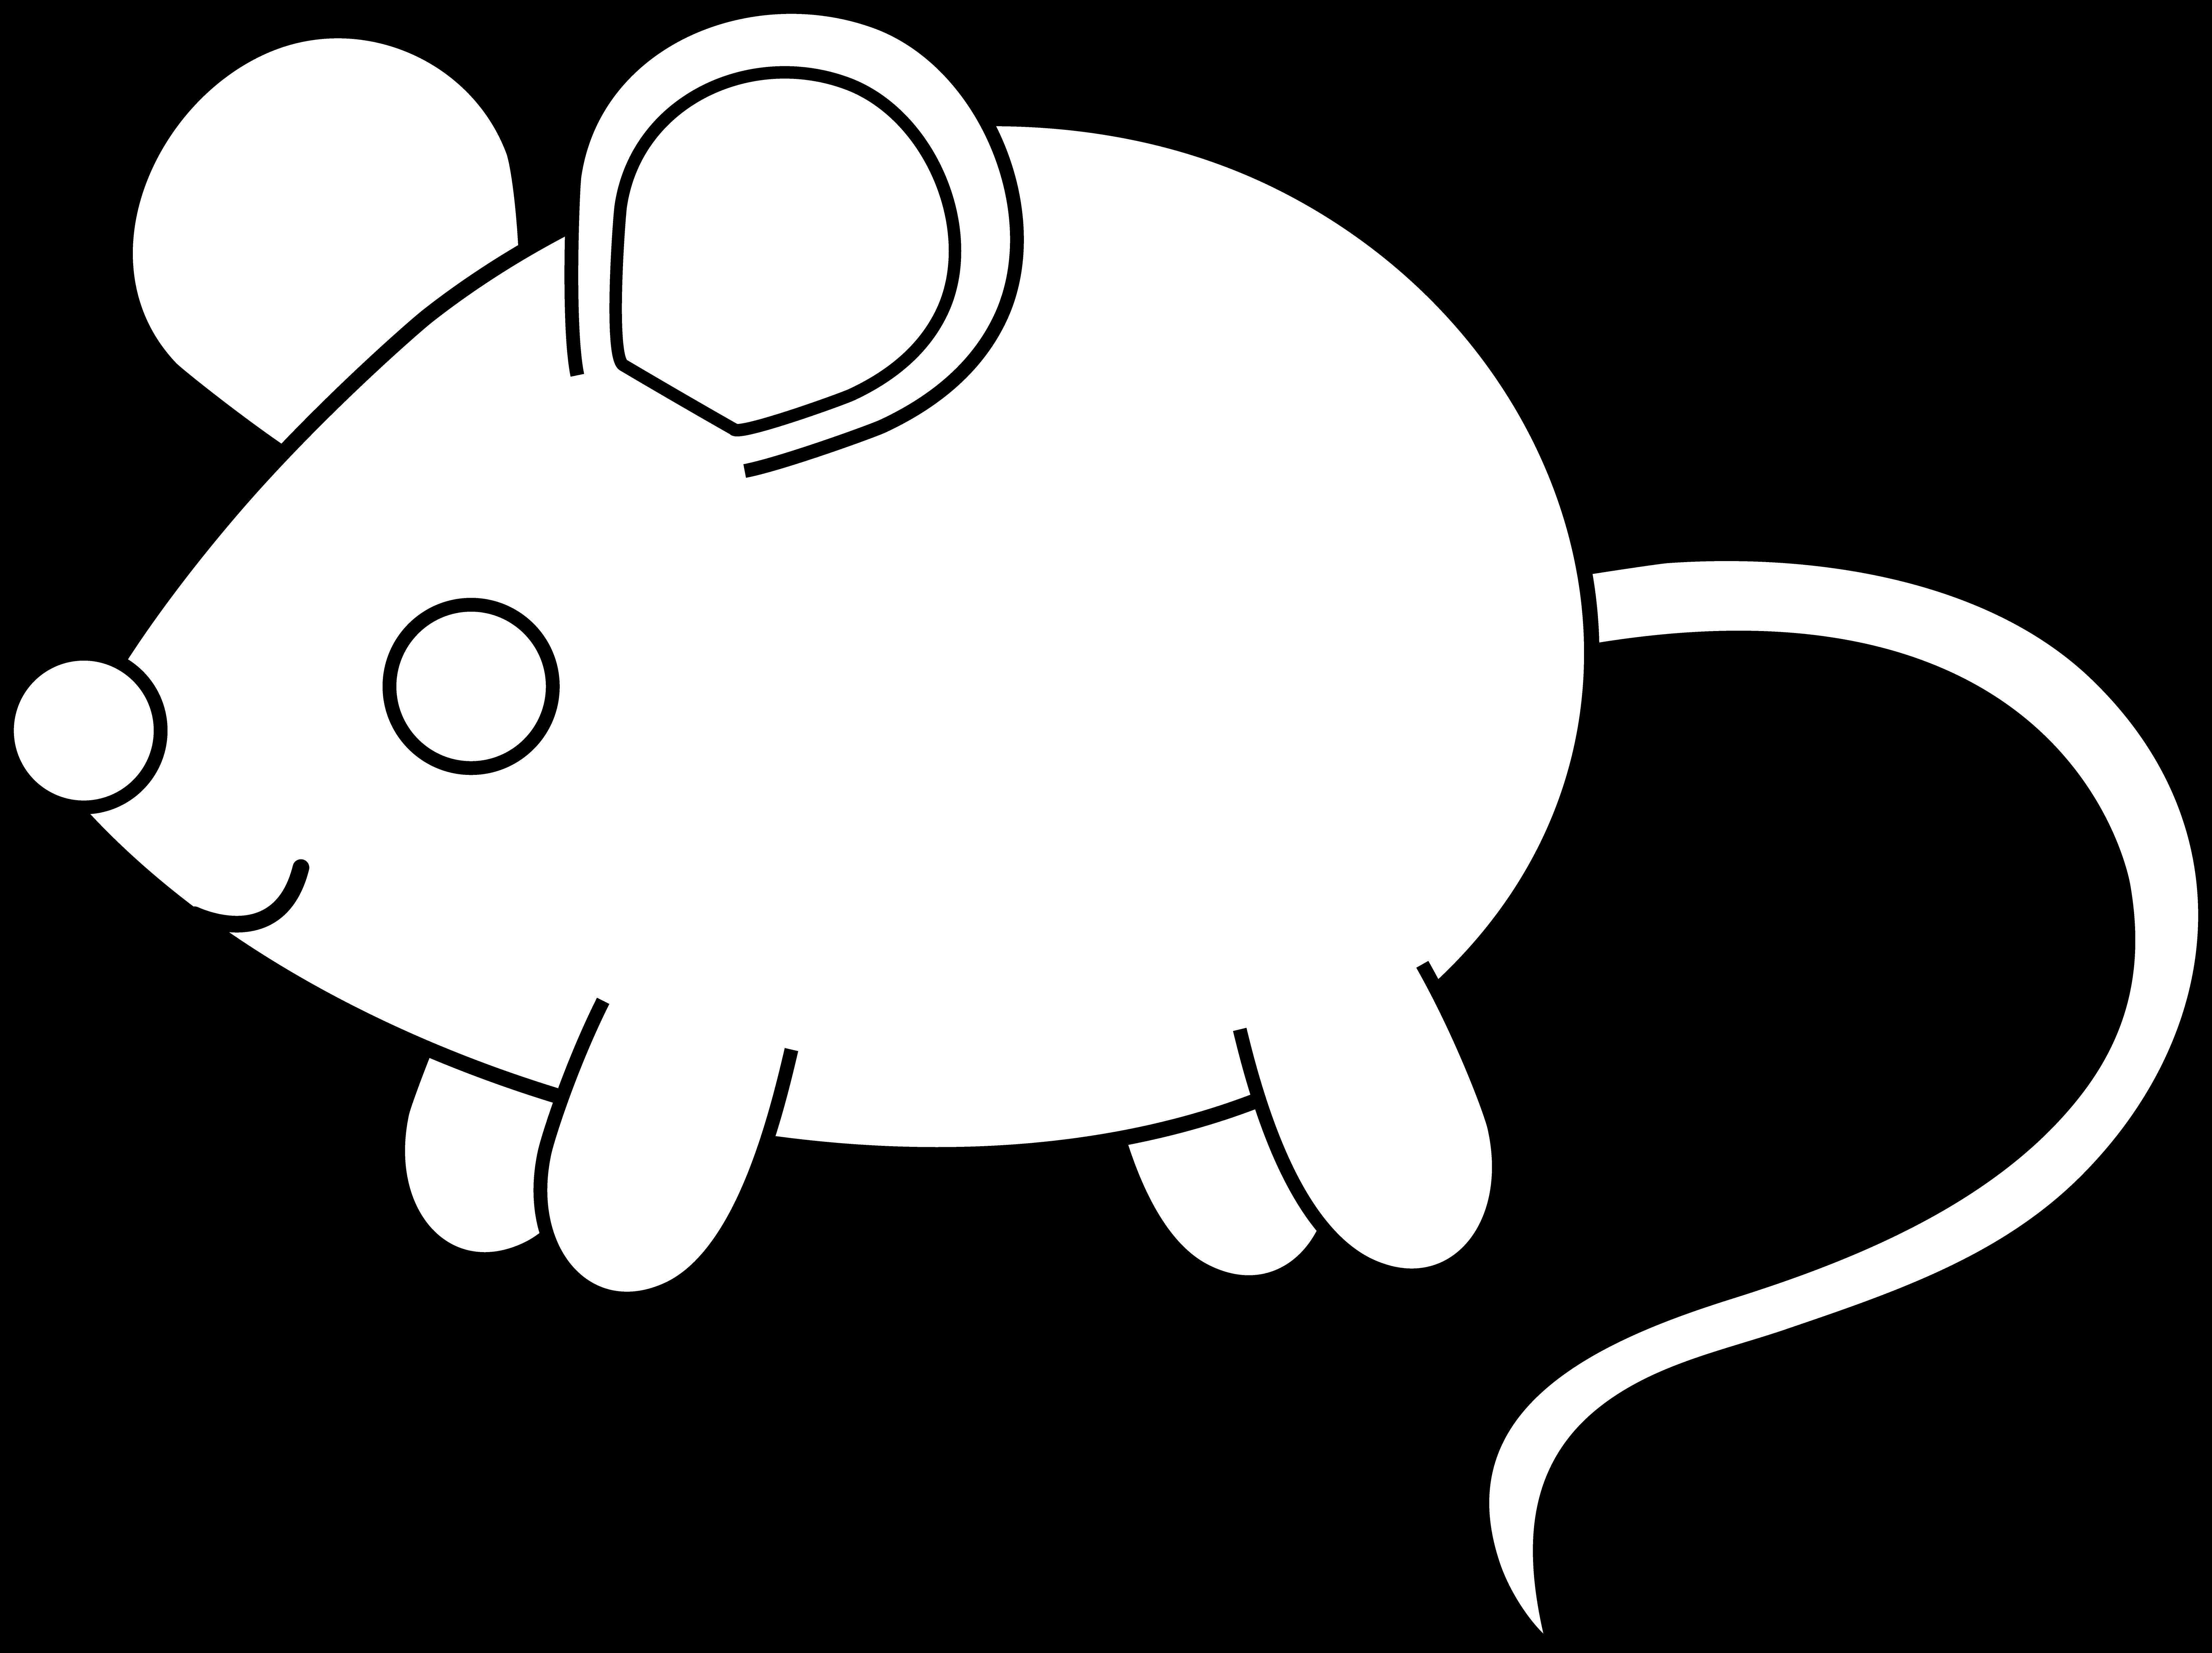 Nest clipart mouse. Cute panda free images